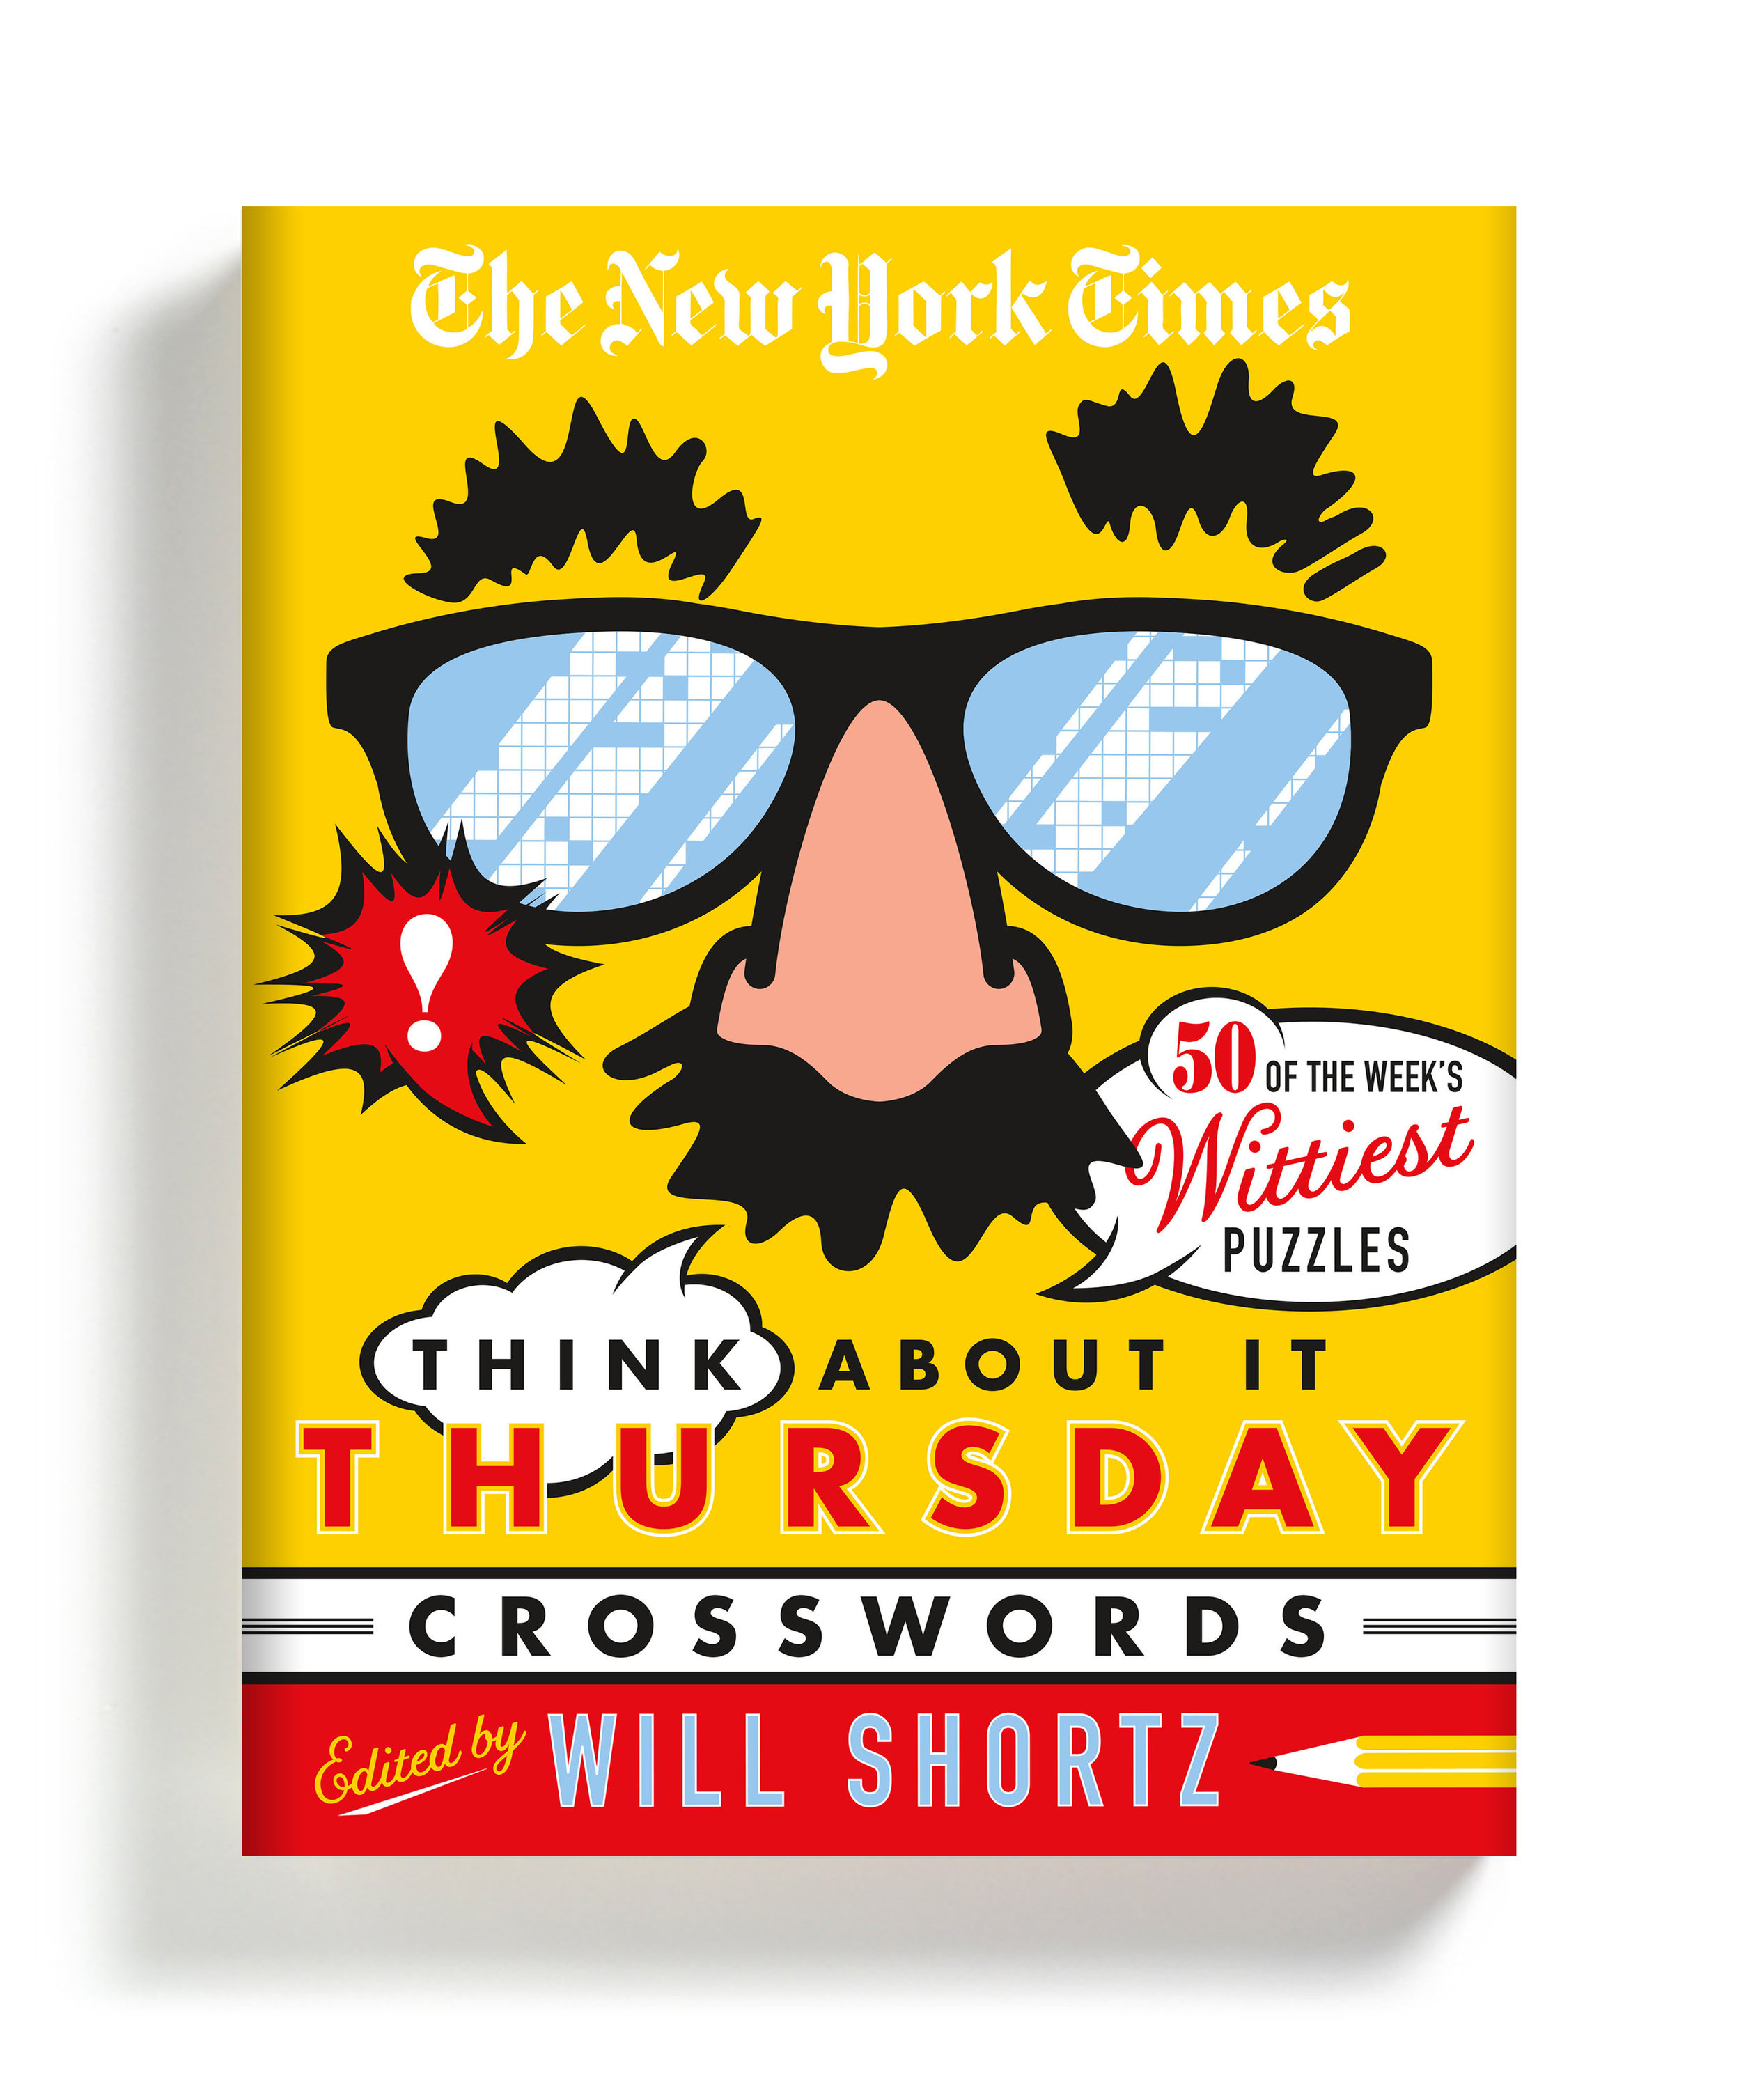 NYT Think About It Thursday Crosswords_Vol 1_3D.jpg